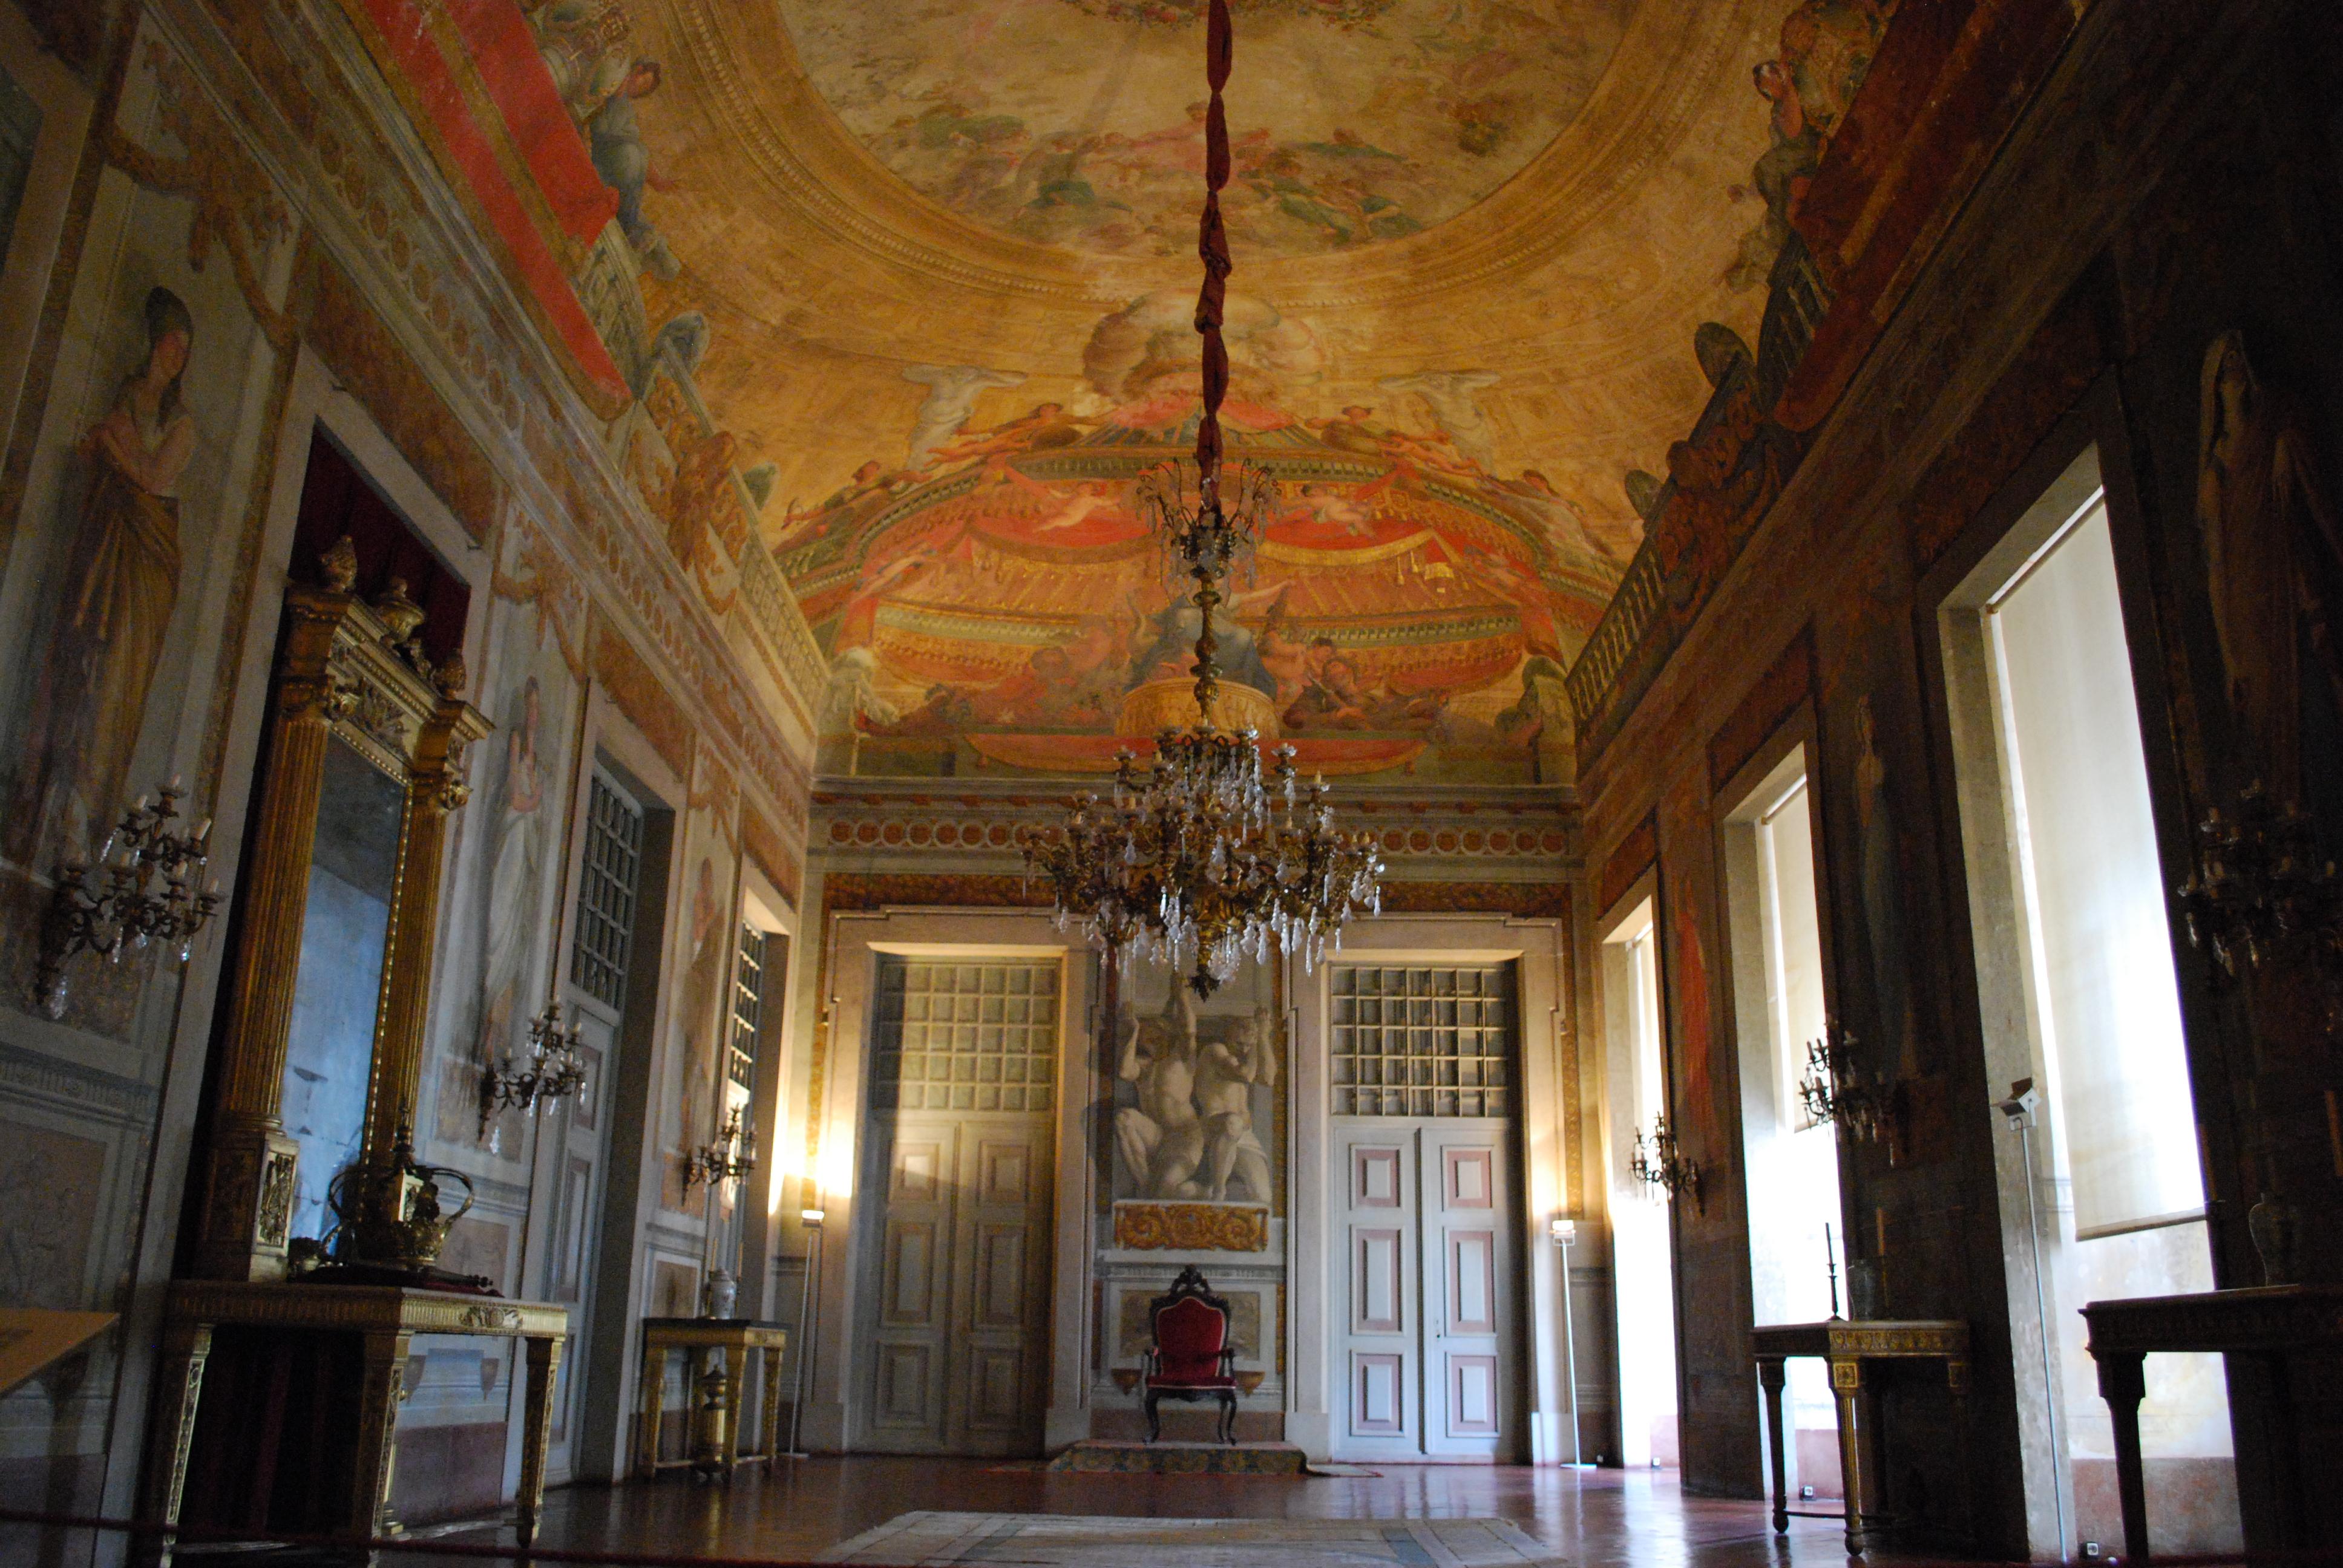 「palacio mafra」的圖片搜尋結果